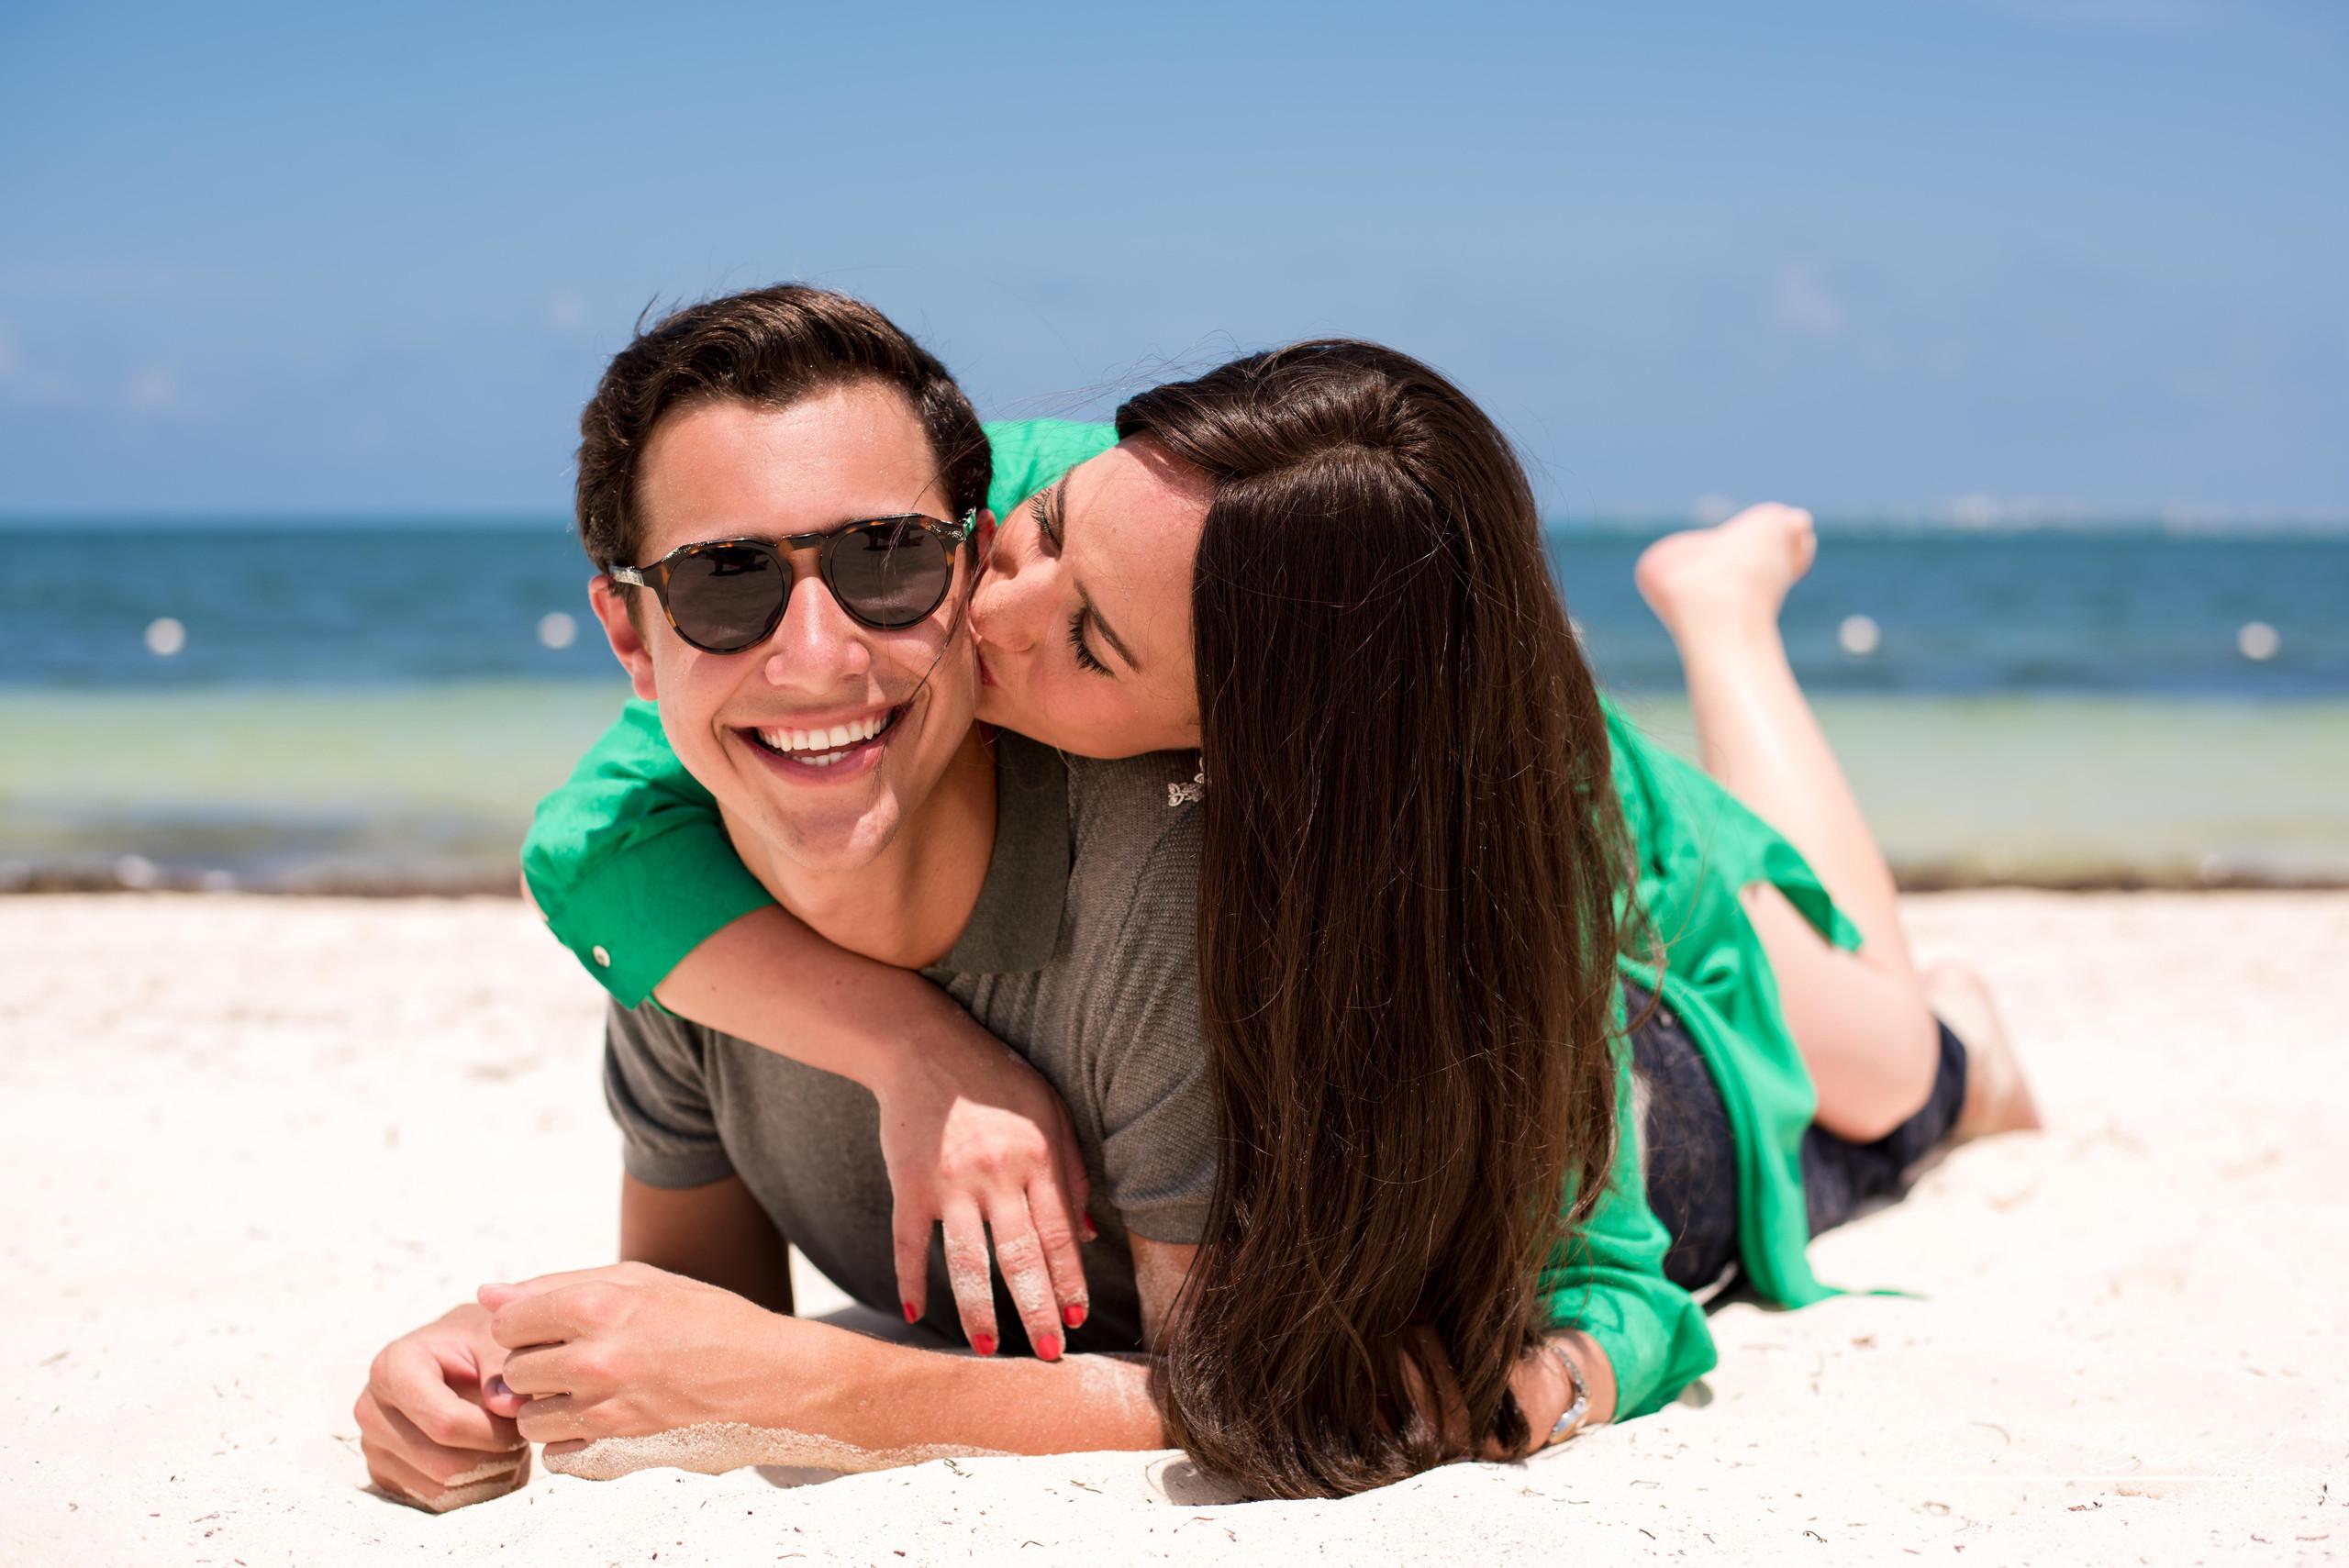 couple+hotel+atelier+happy+love+together+playa+mujeres+destination+photographer+photo+kiss+beach+caribe+cancun+honeymoon+celebration